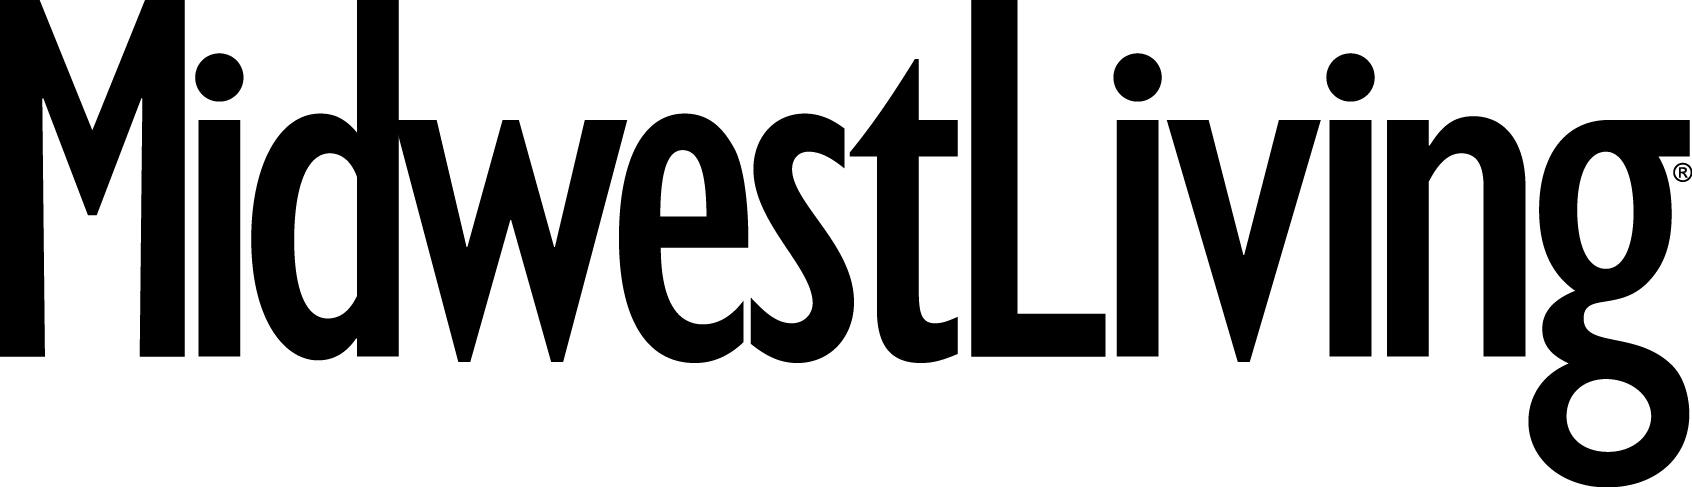 midwest-living-logo.jpg